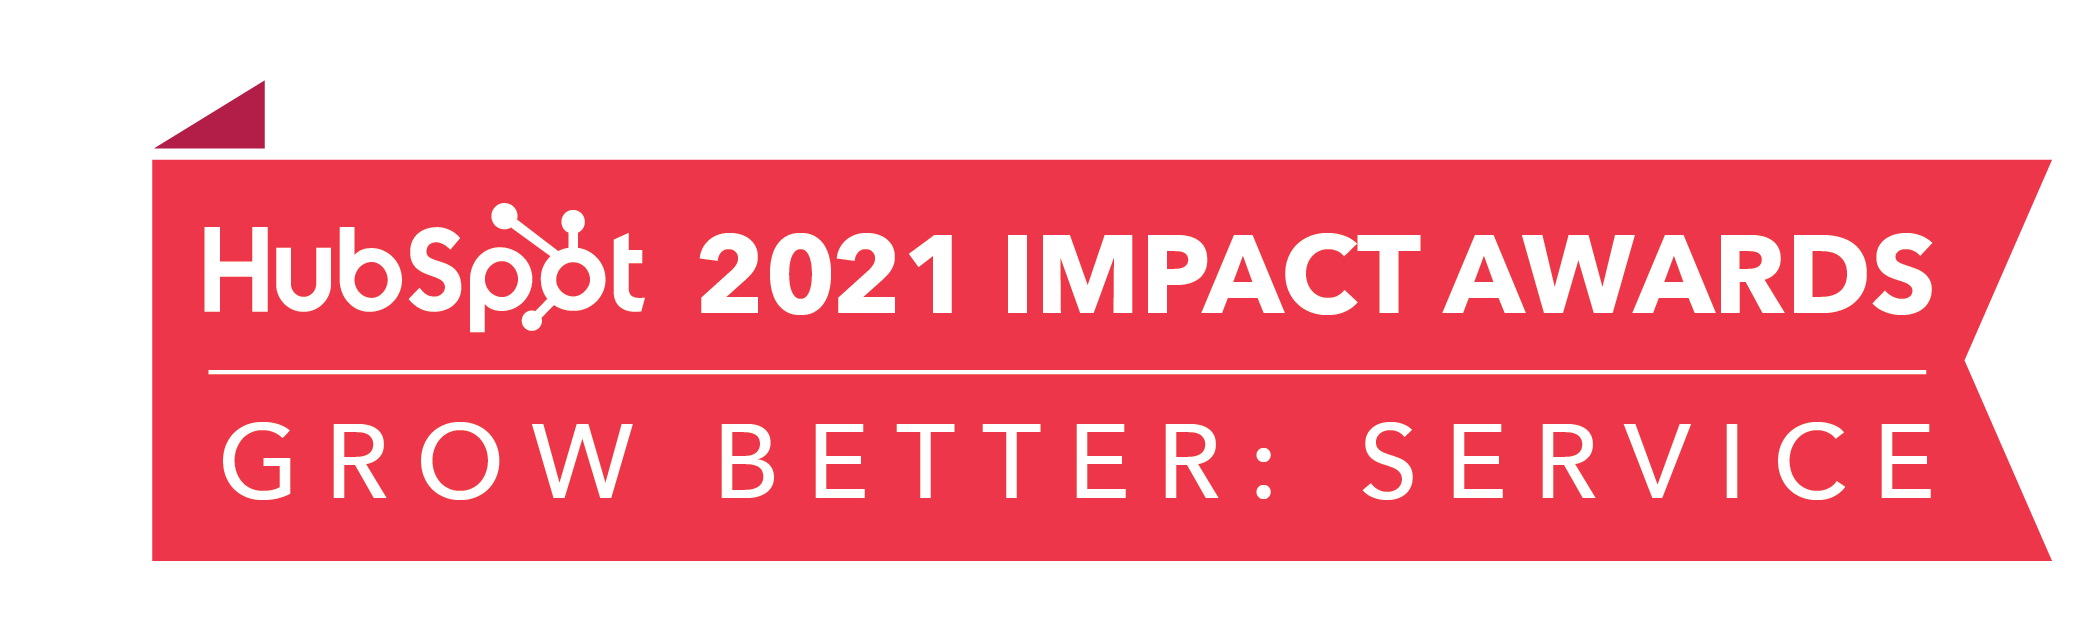 HubSpot_ImpactAwards_2021_GBService2